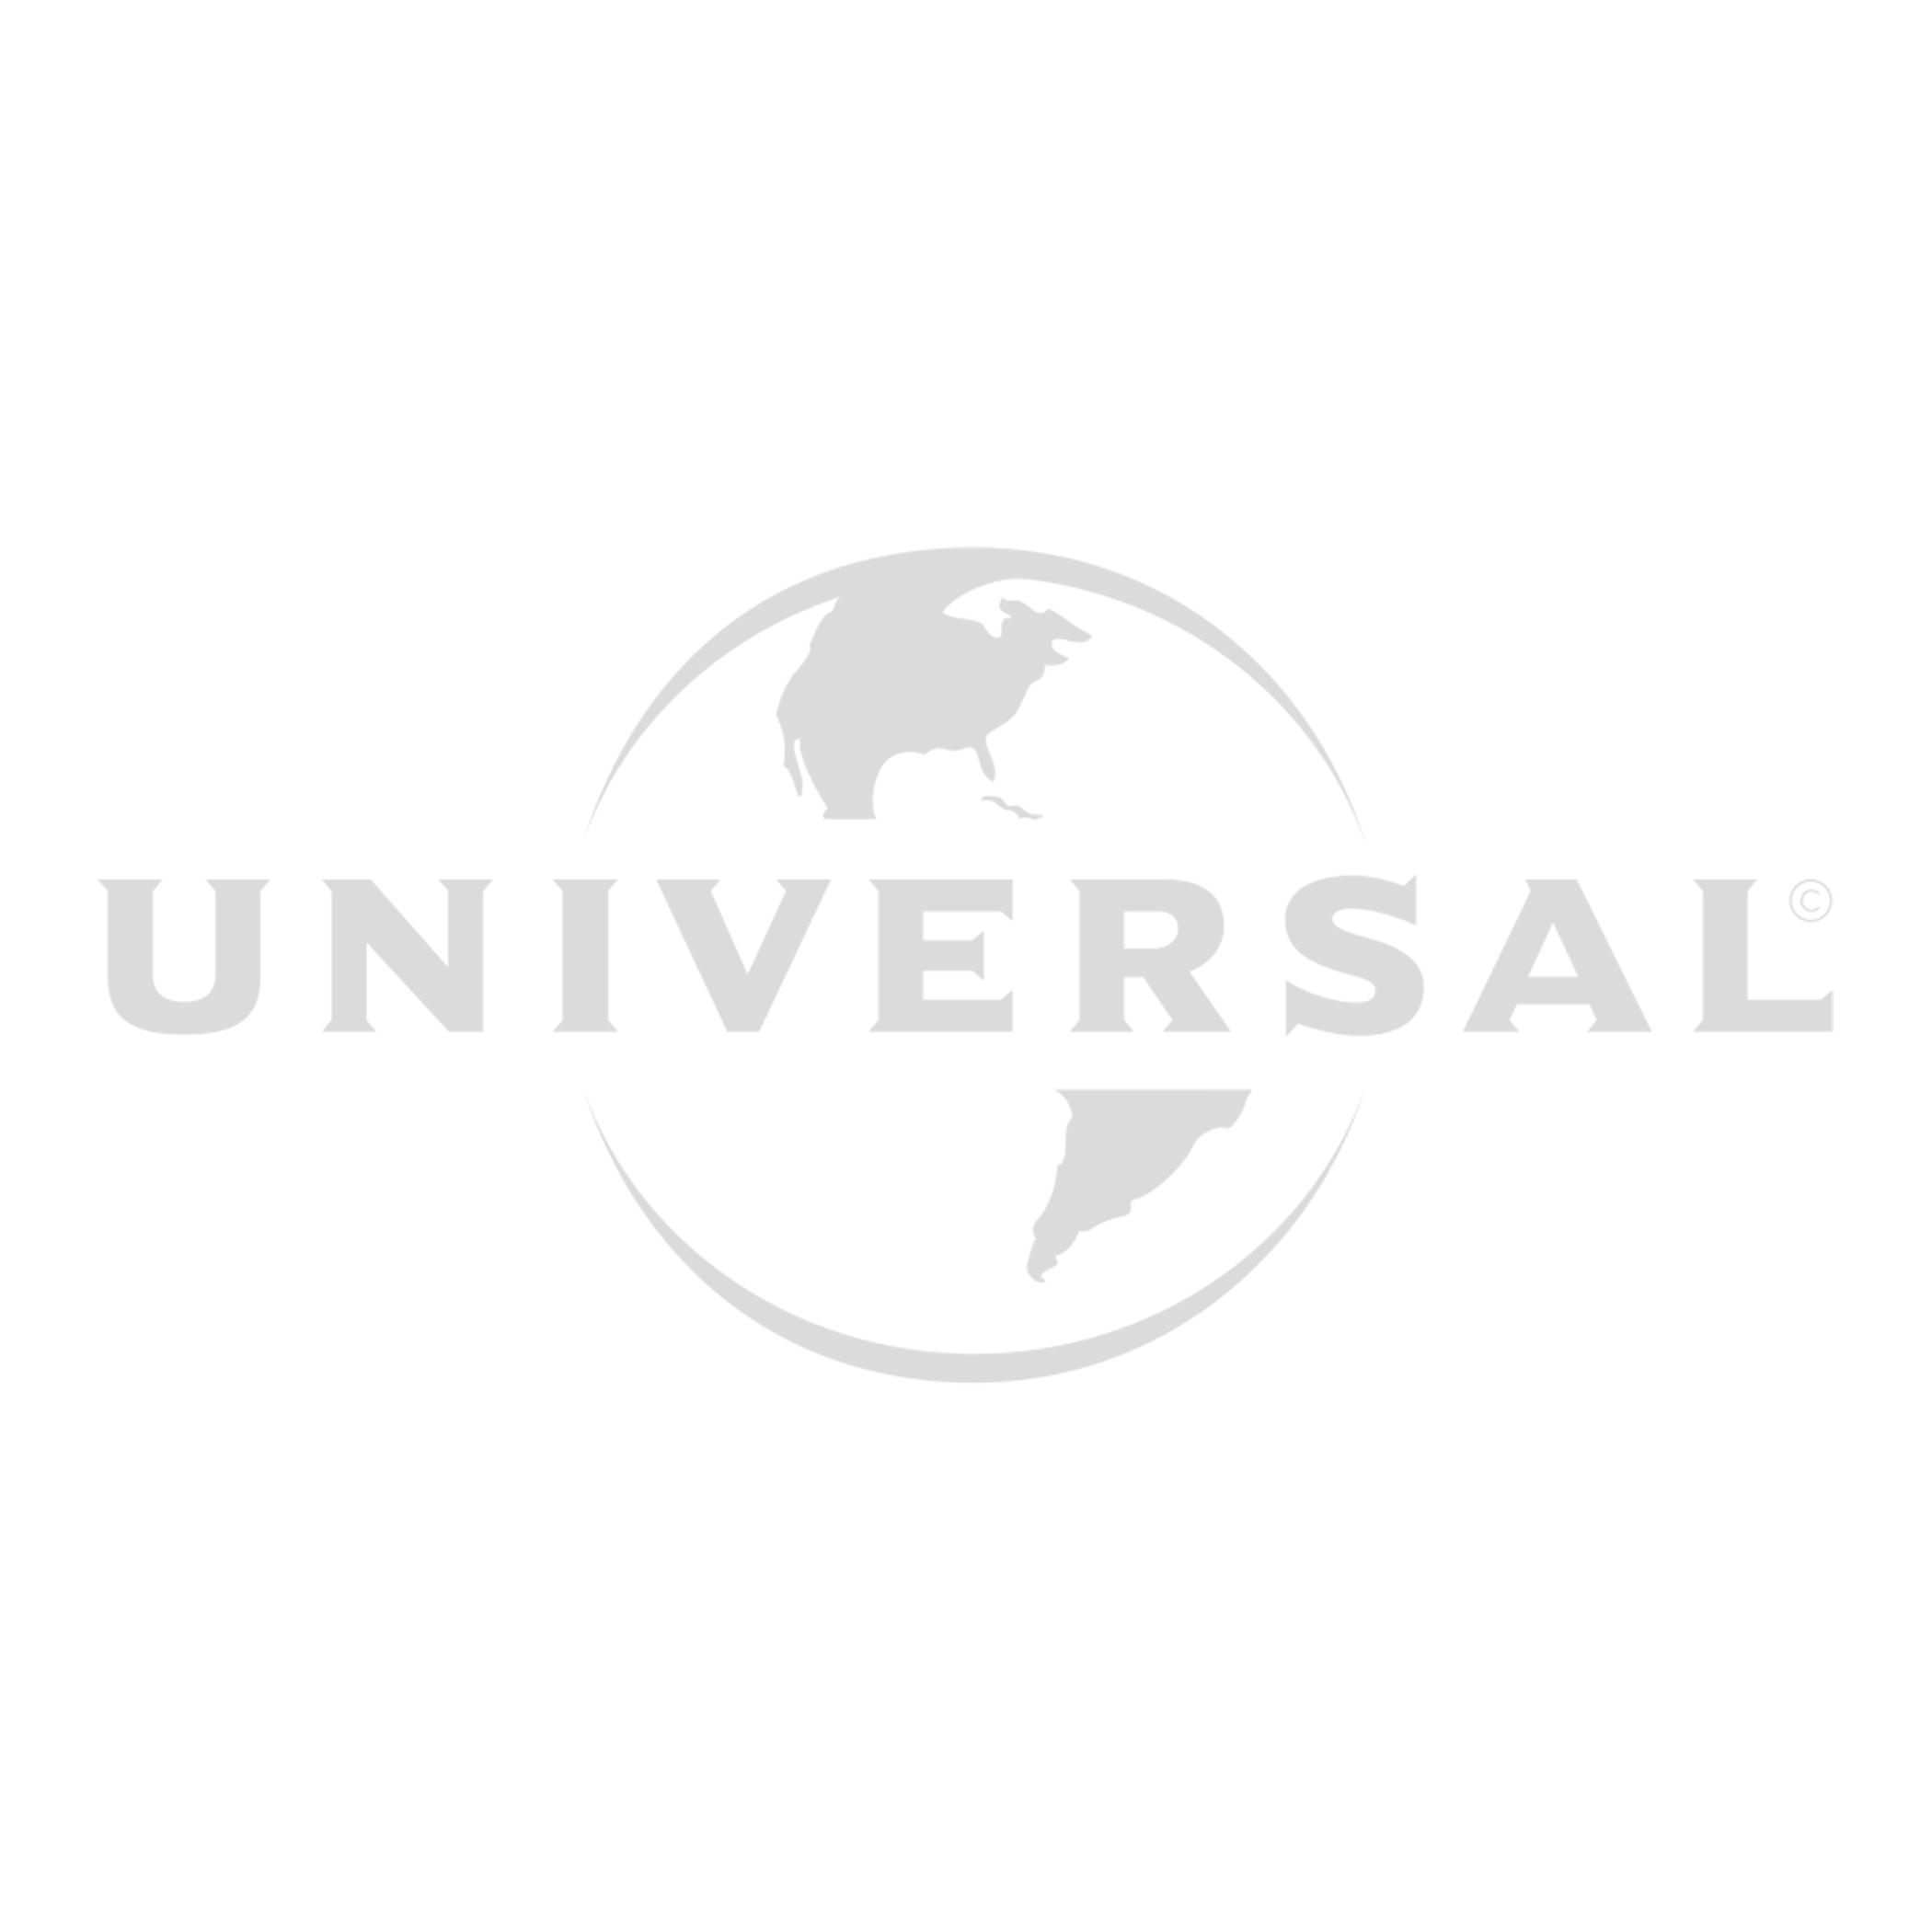 UNIV_GRAY.png